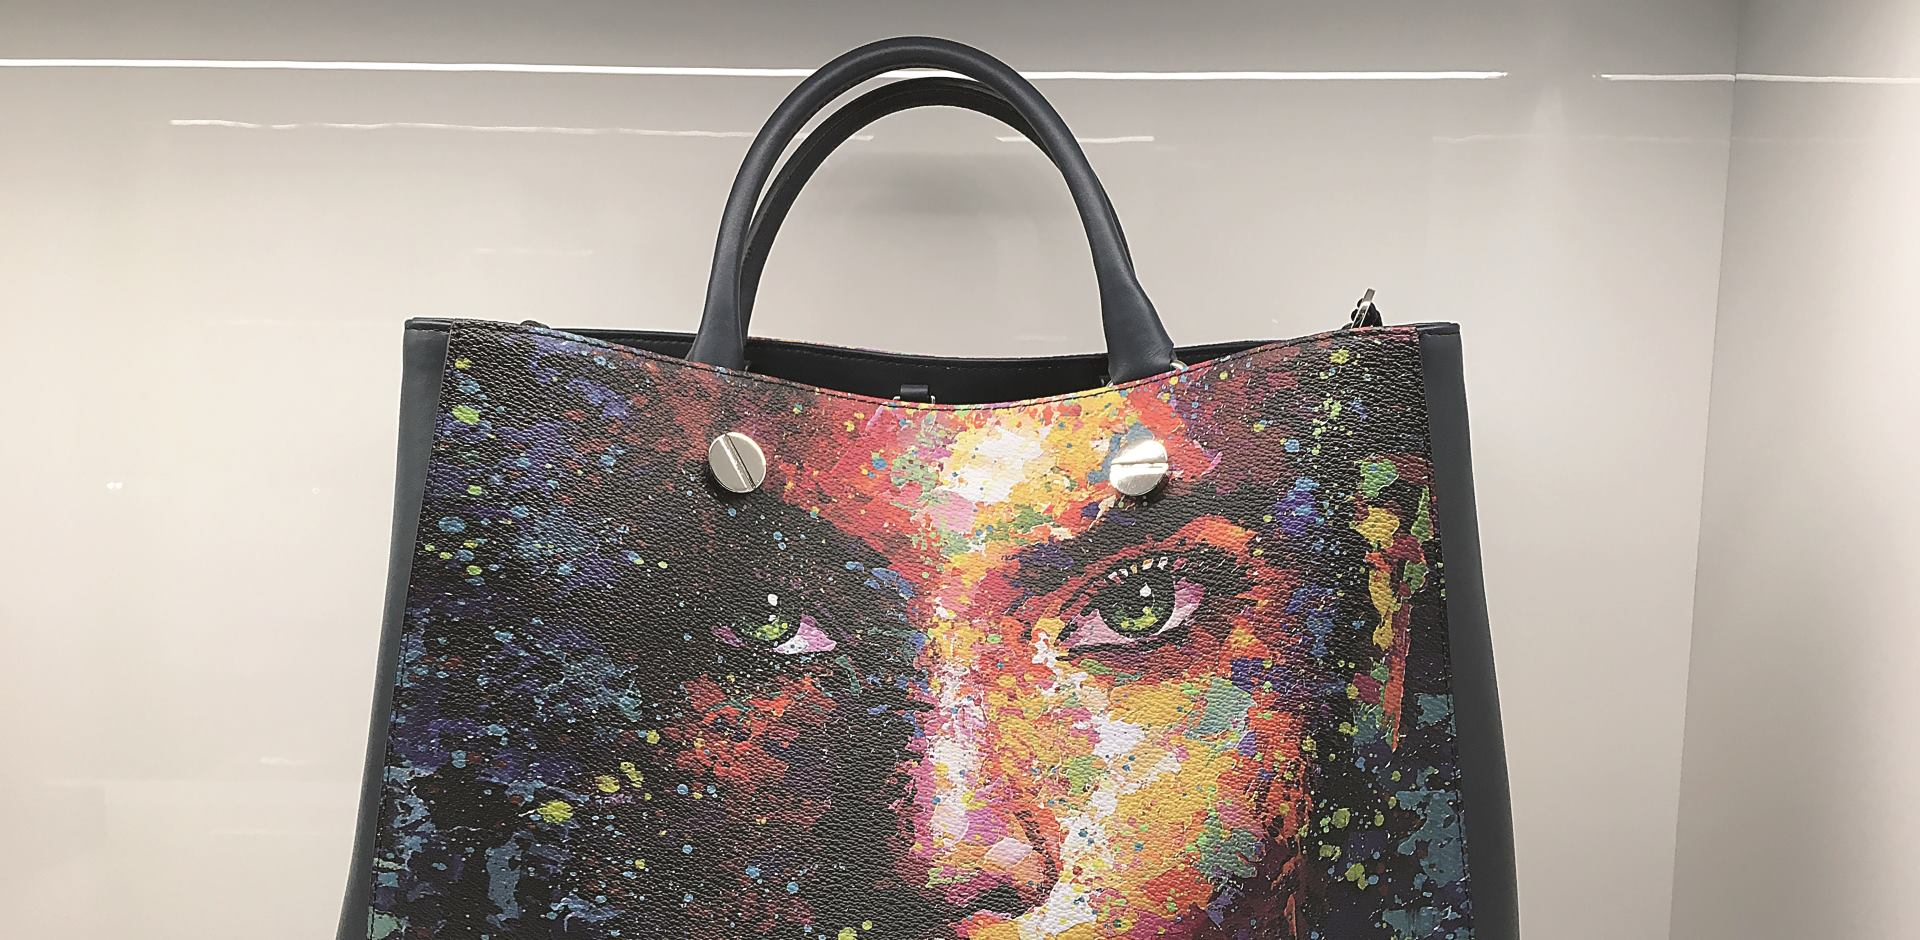 Glamurozne Bagghy torbe u Vauroomu